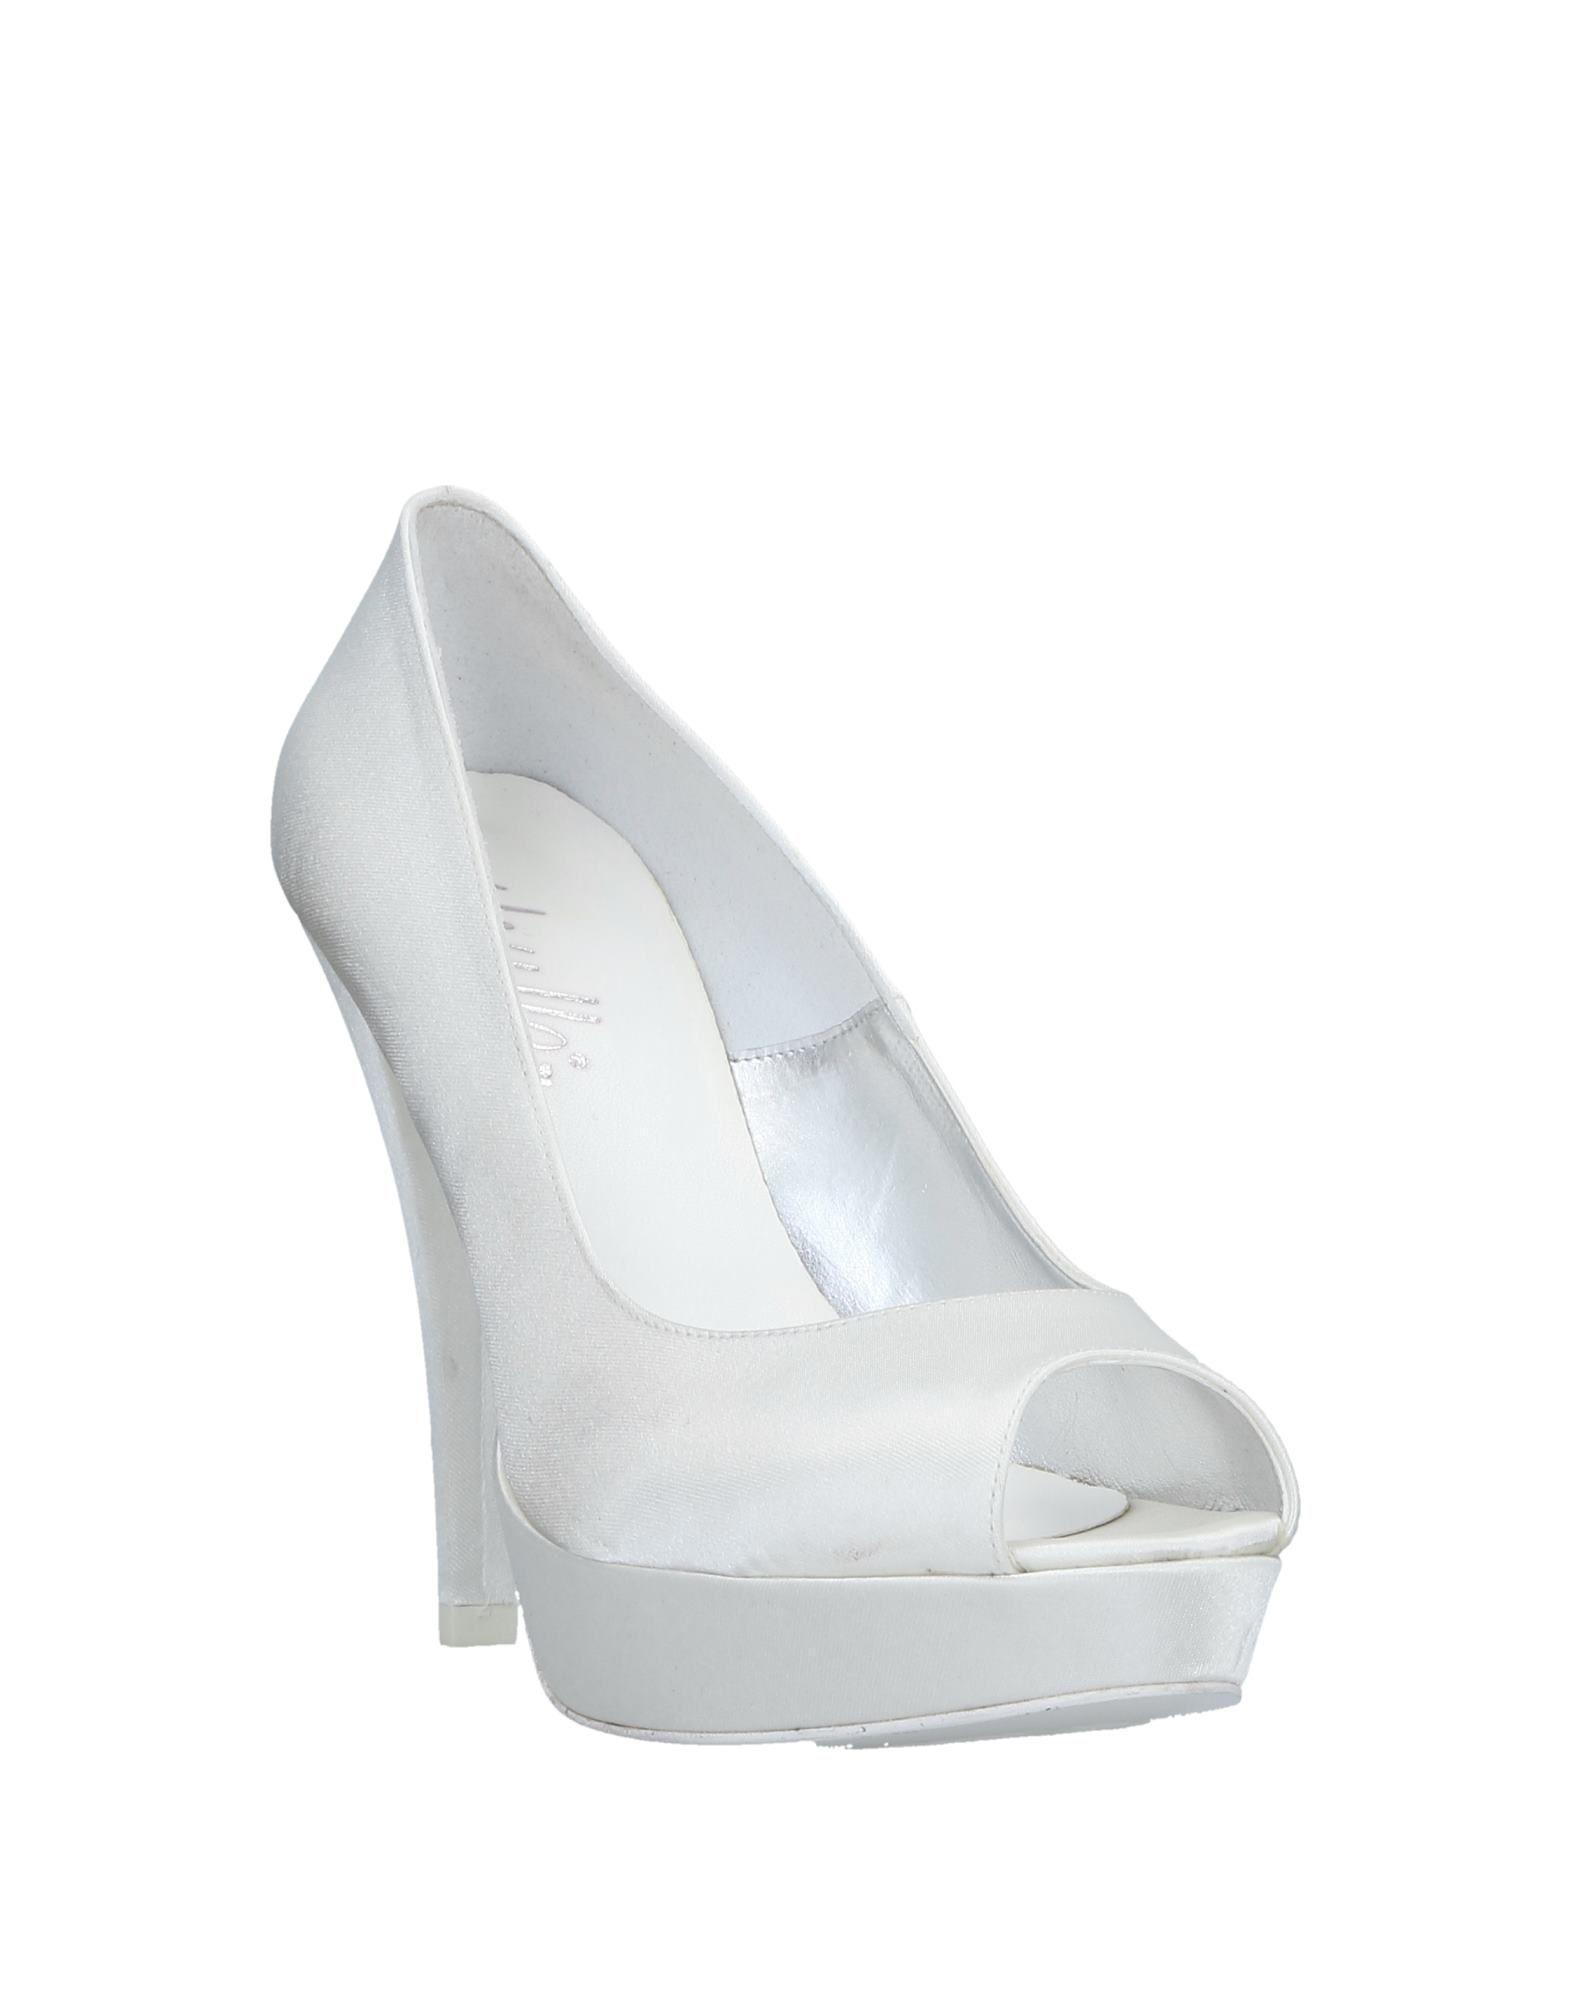 Thulle® By Melluso Pumps Damen  11535004GC Gute Qualität beliebte Schuhe